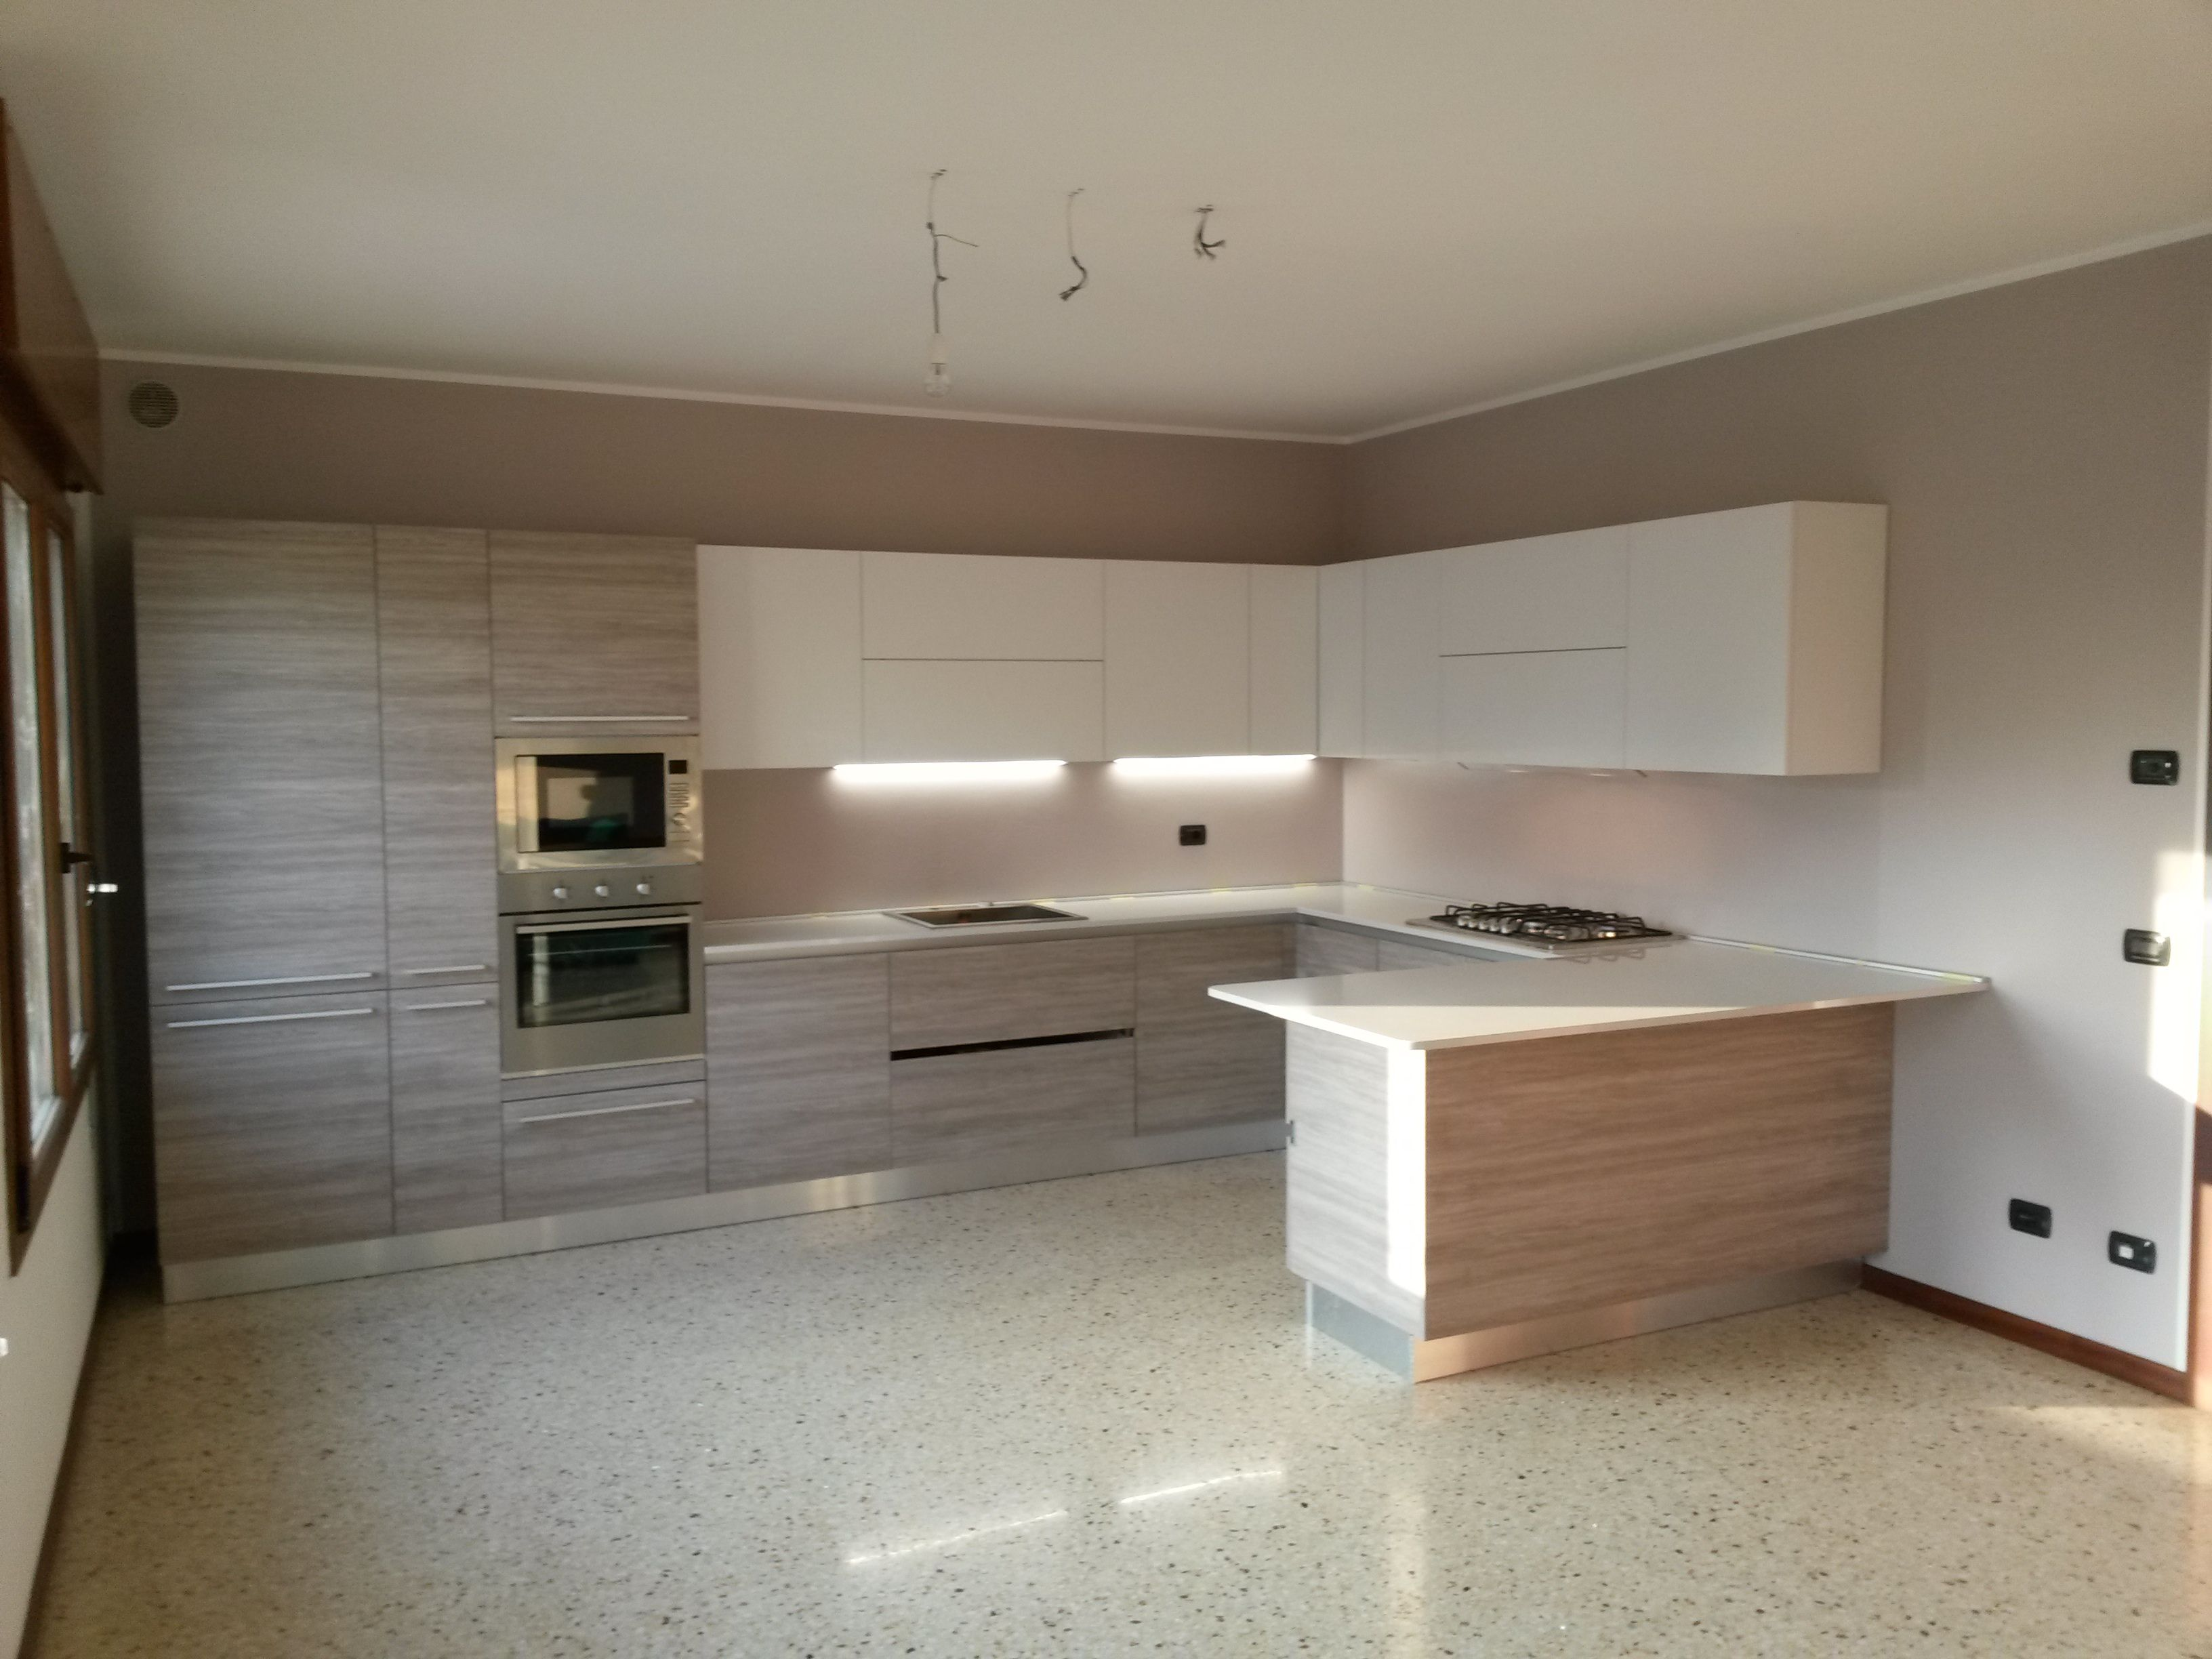 Cucina - Artec - Lungomare - sucupira beijesucupira bianco ...